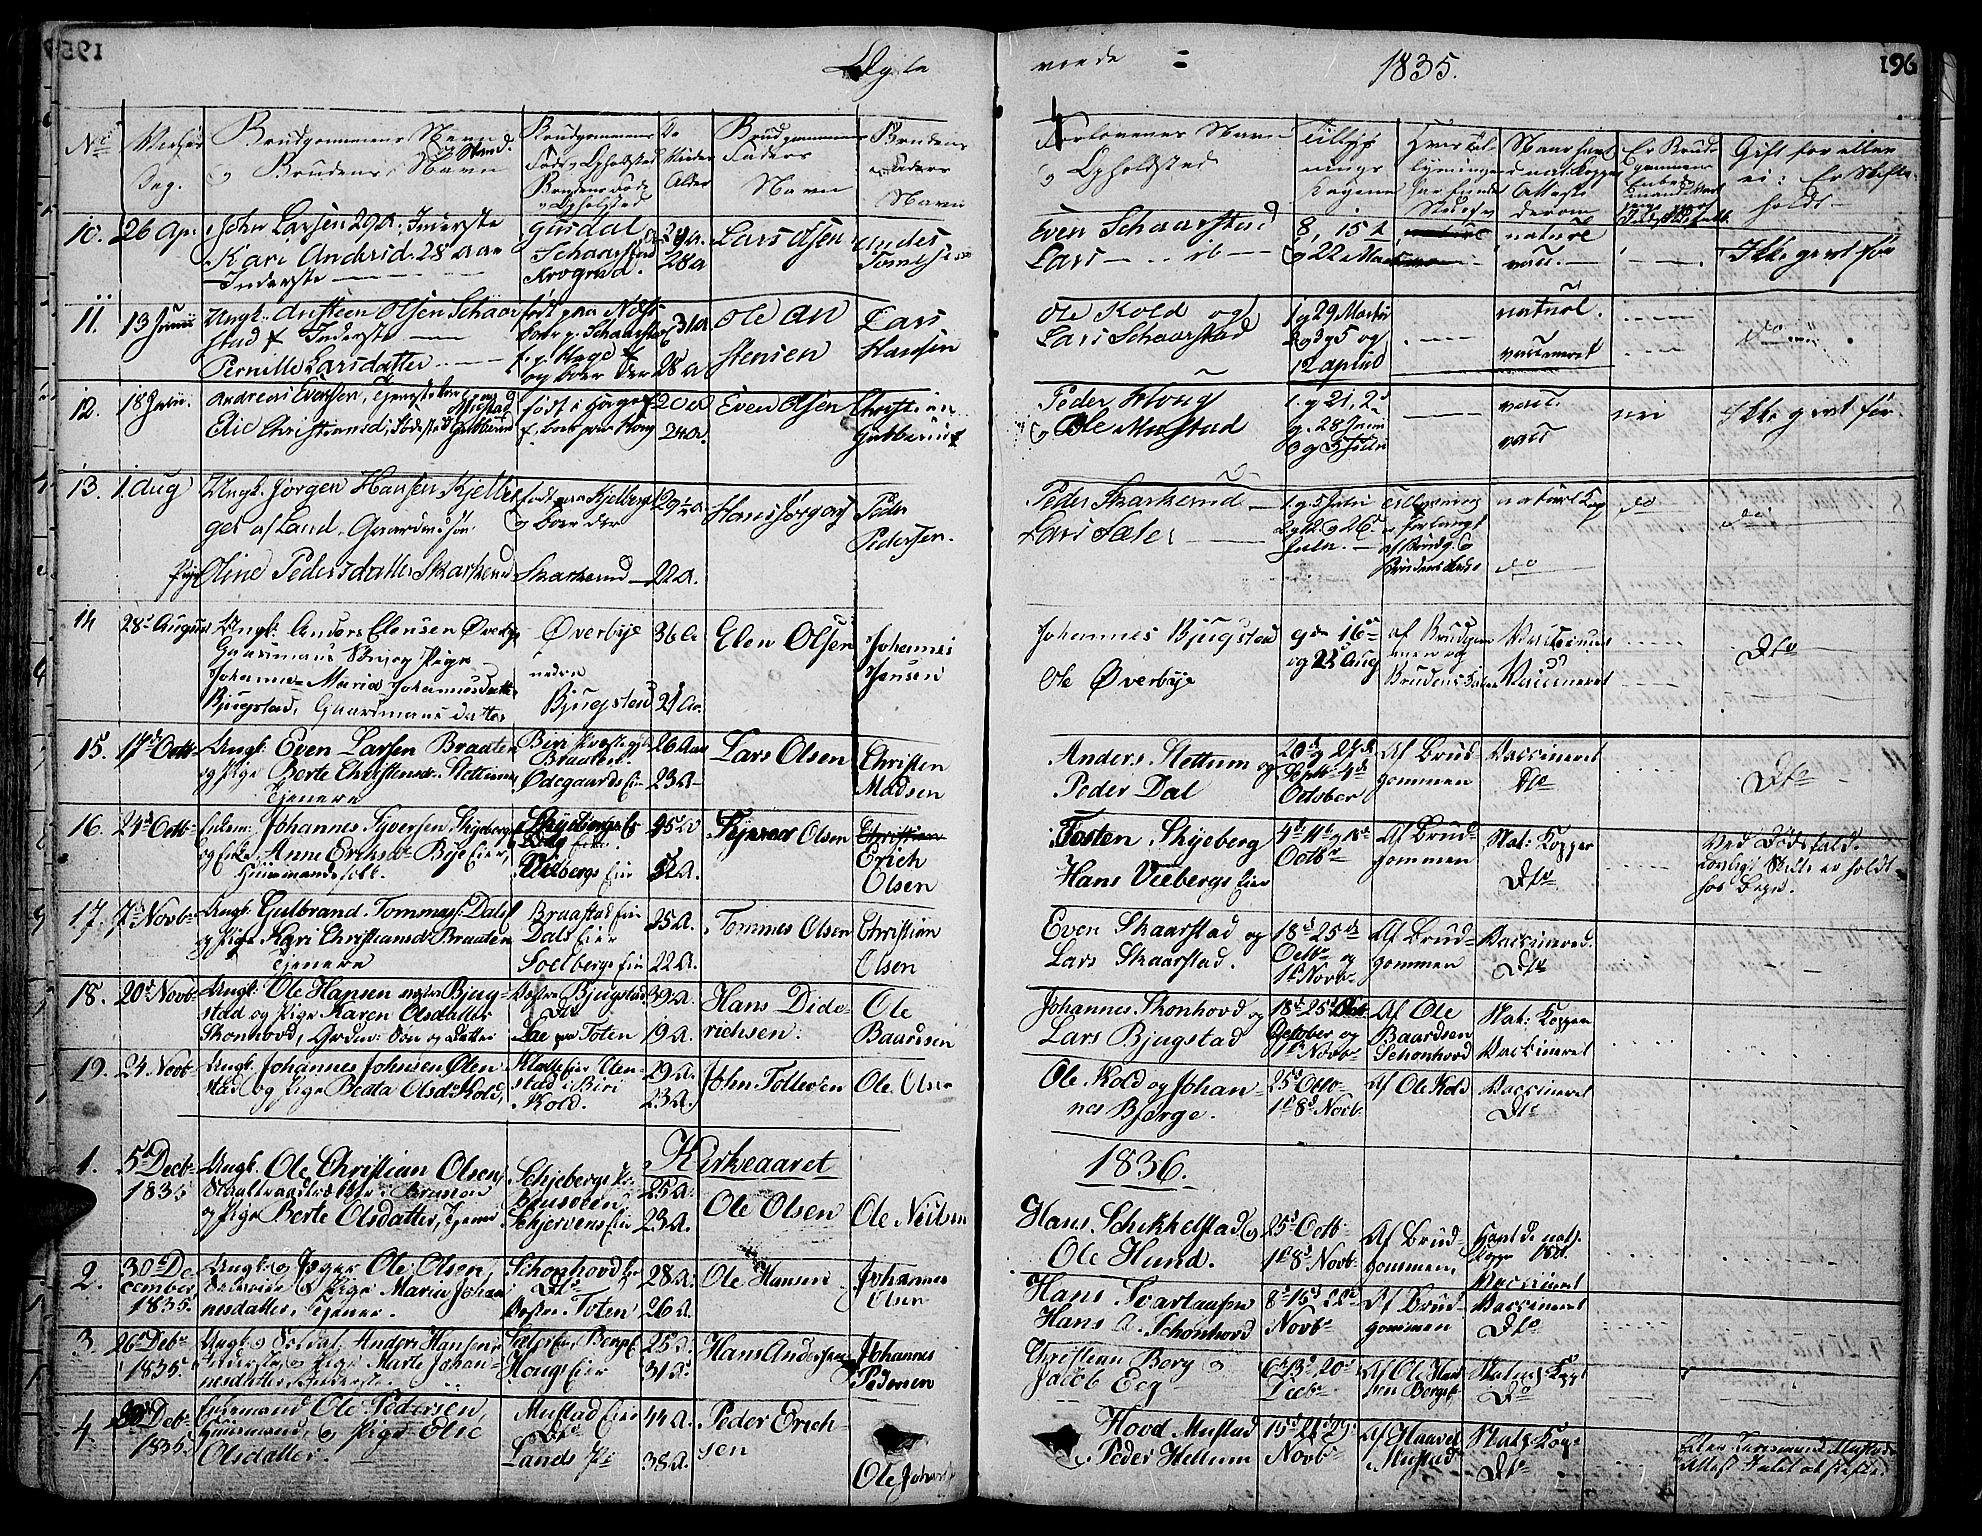 SAH, Vardal prestekontor, H/Ha/Hab/L0004: Klokkerbok nr. 4, 1831-1853, s. 196